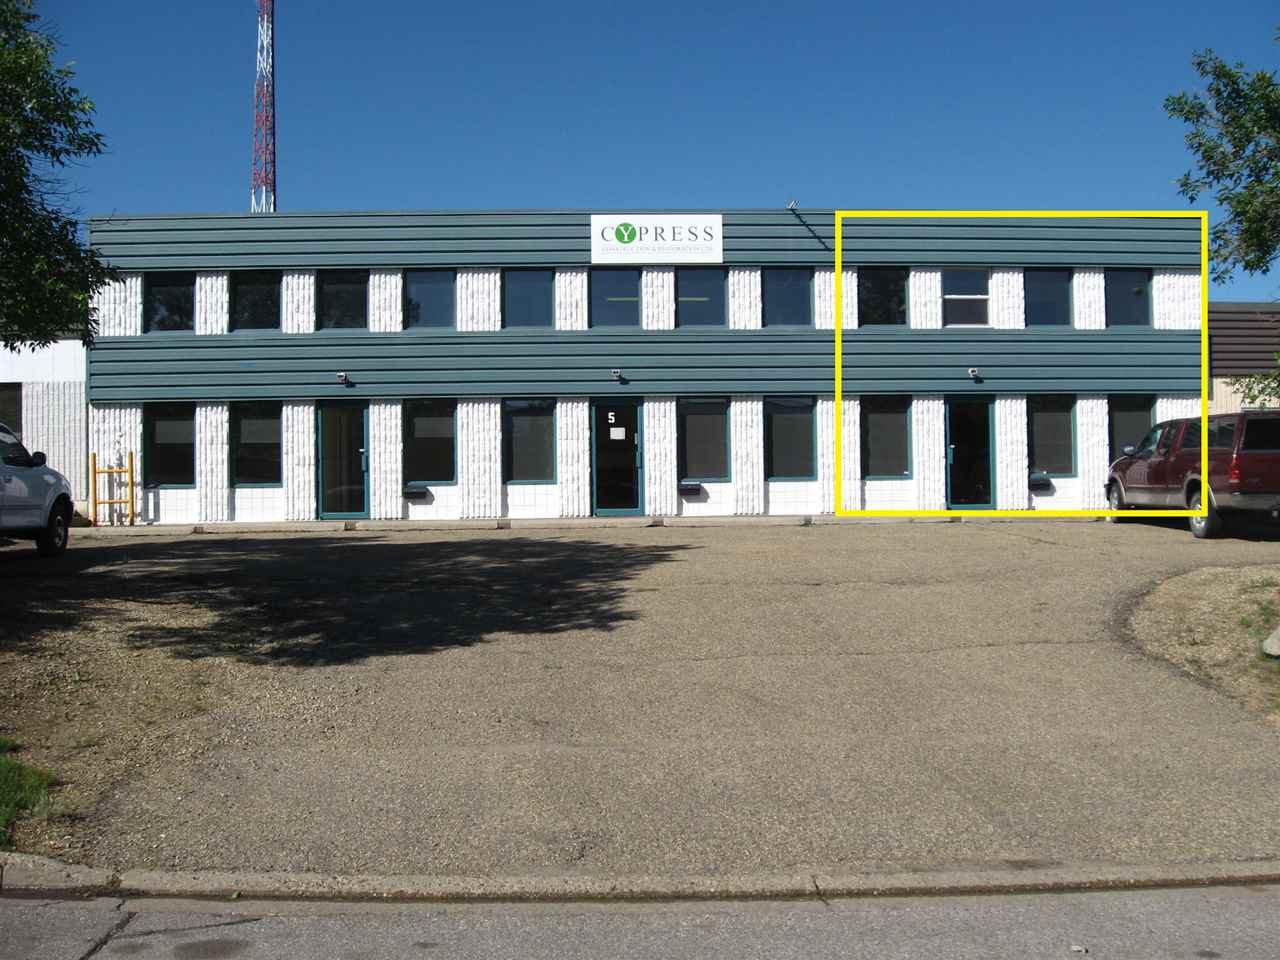 Main Photo: 5 Rayborn Crescent: St. Albert Industrial for lease : MLS®# E4224209